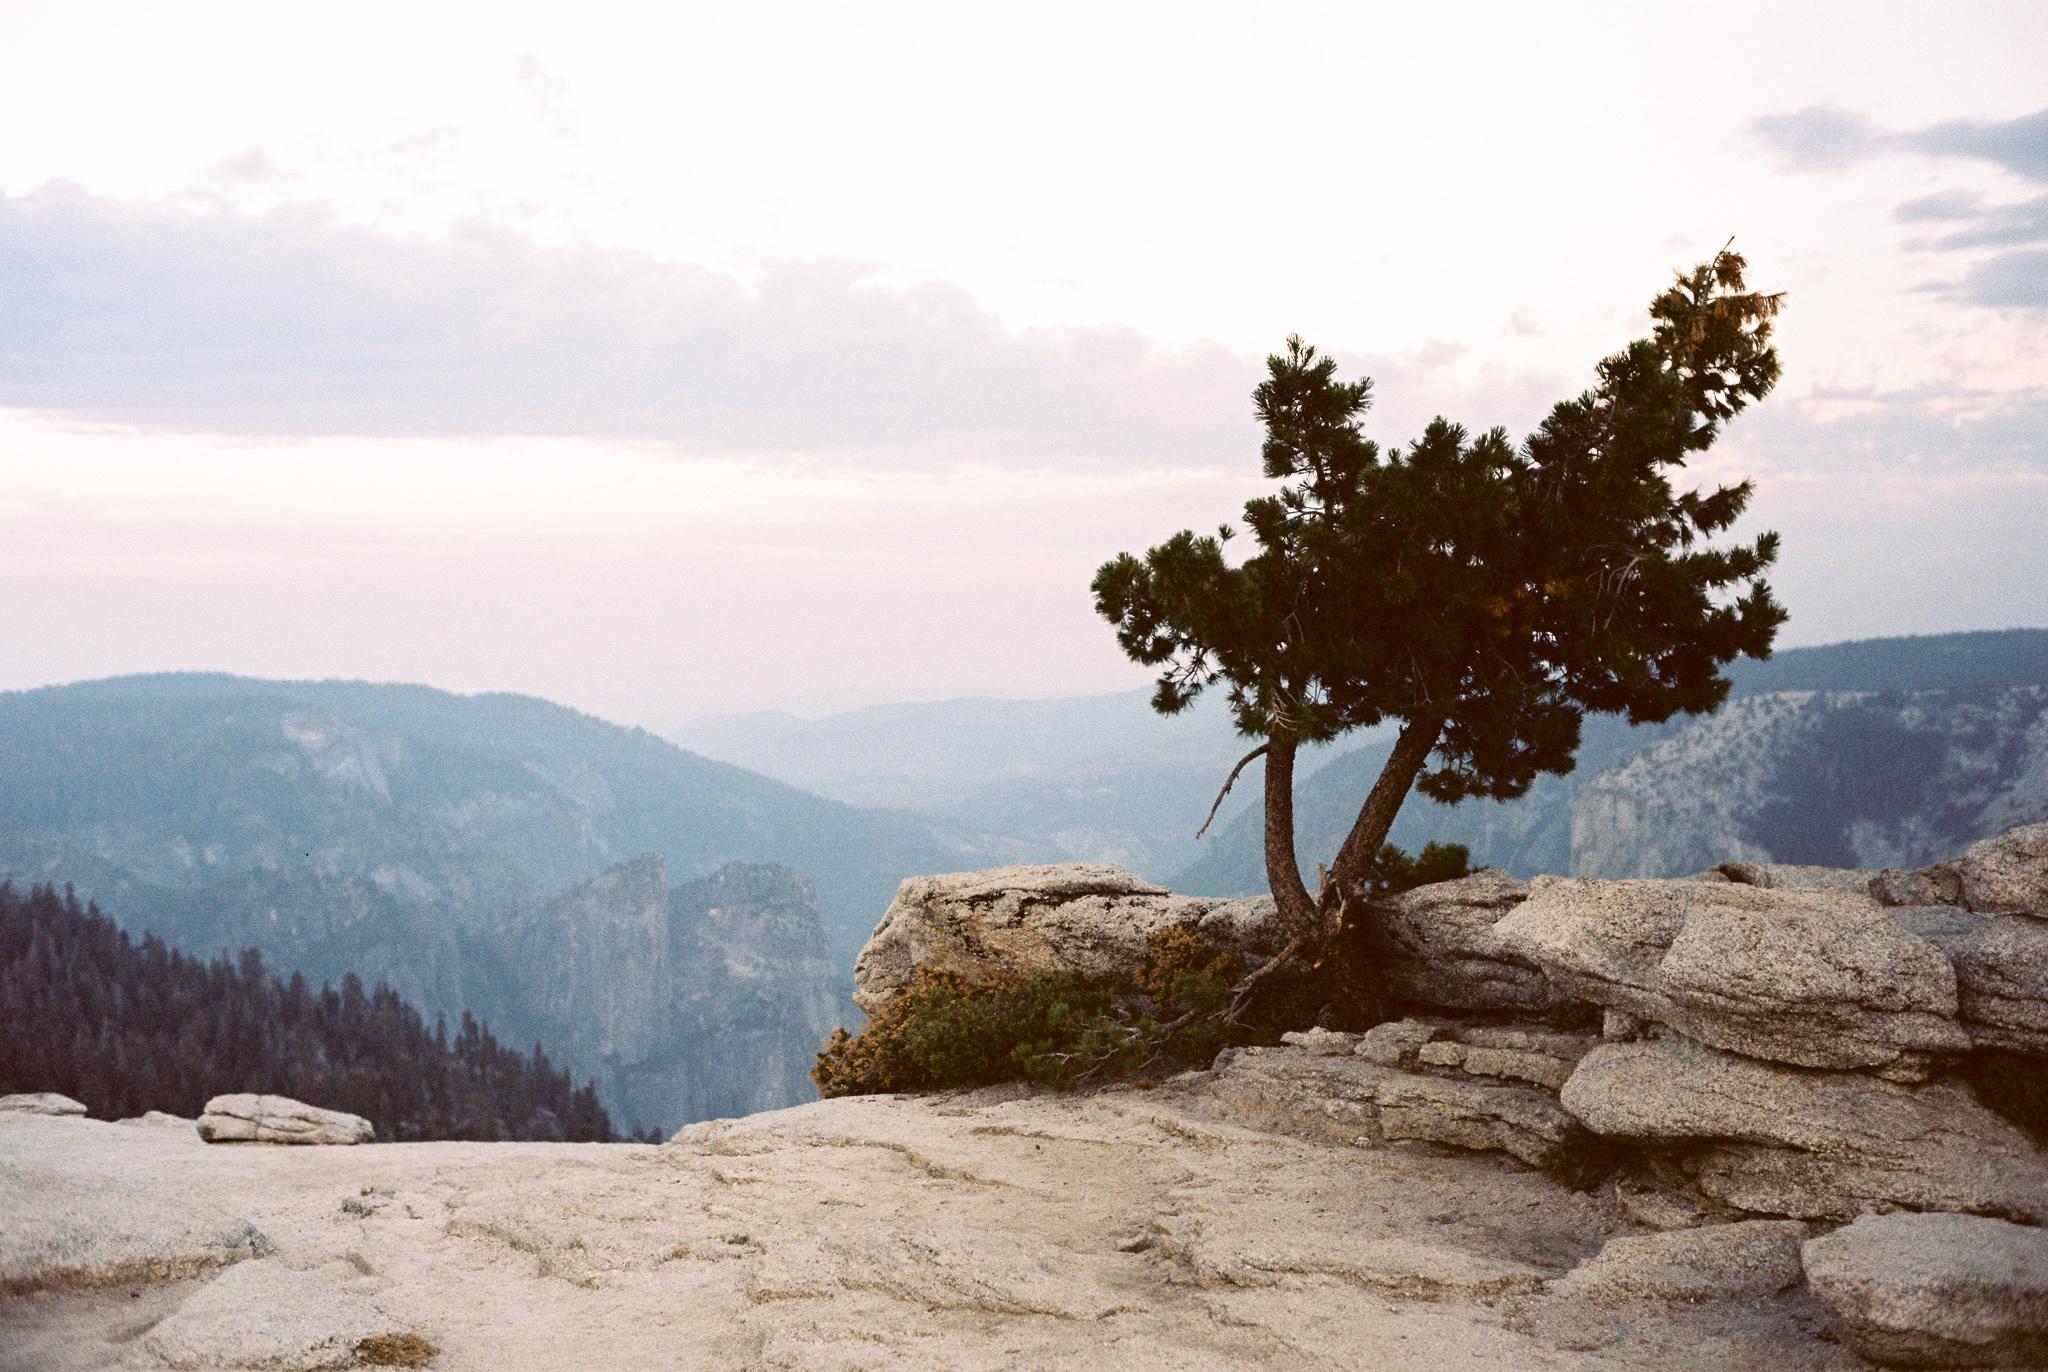 20160821-Film-Yosemite-sentinel-dome.jpg